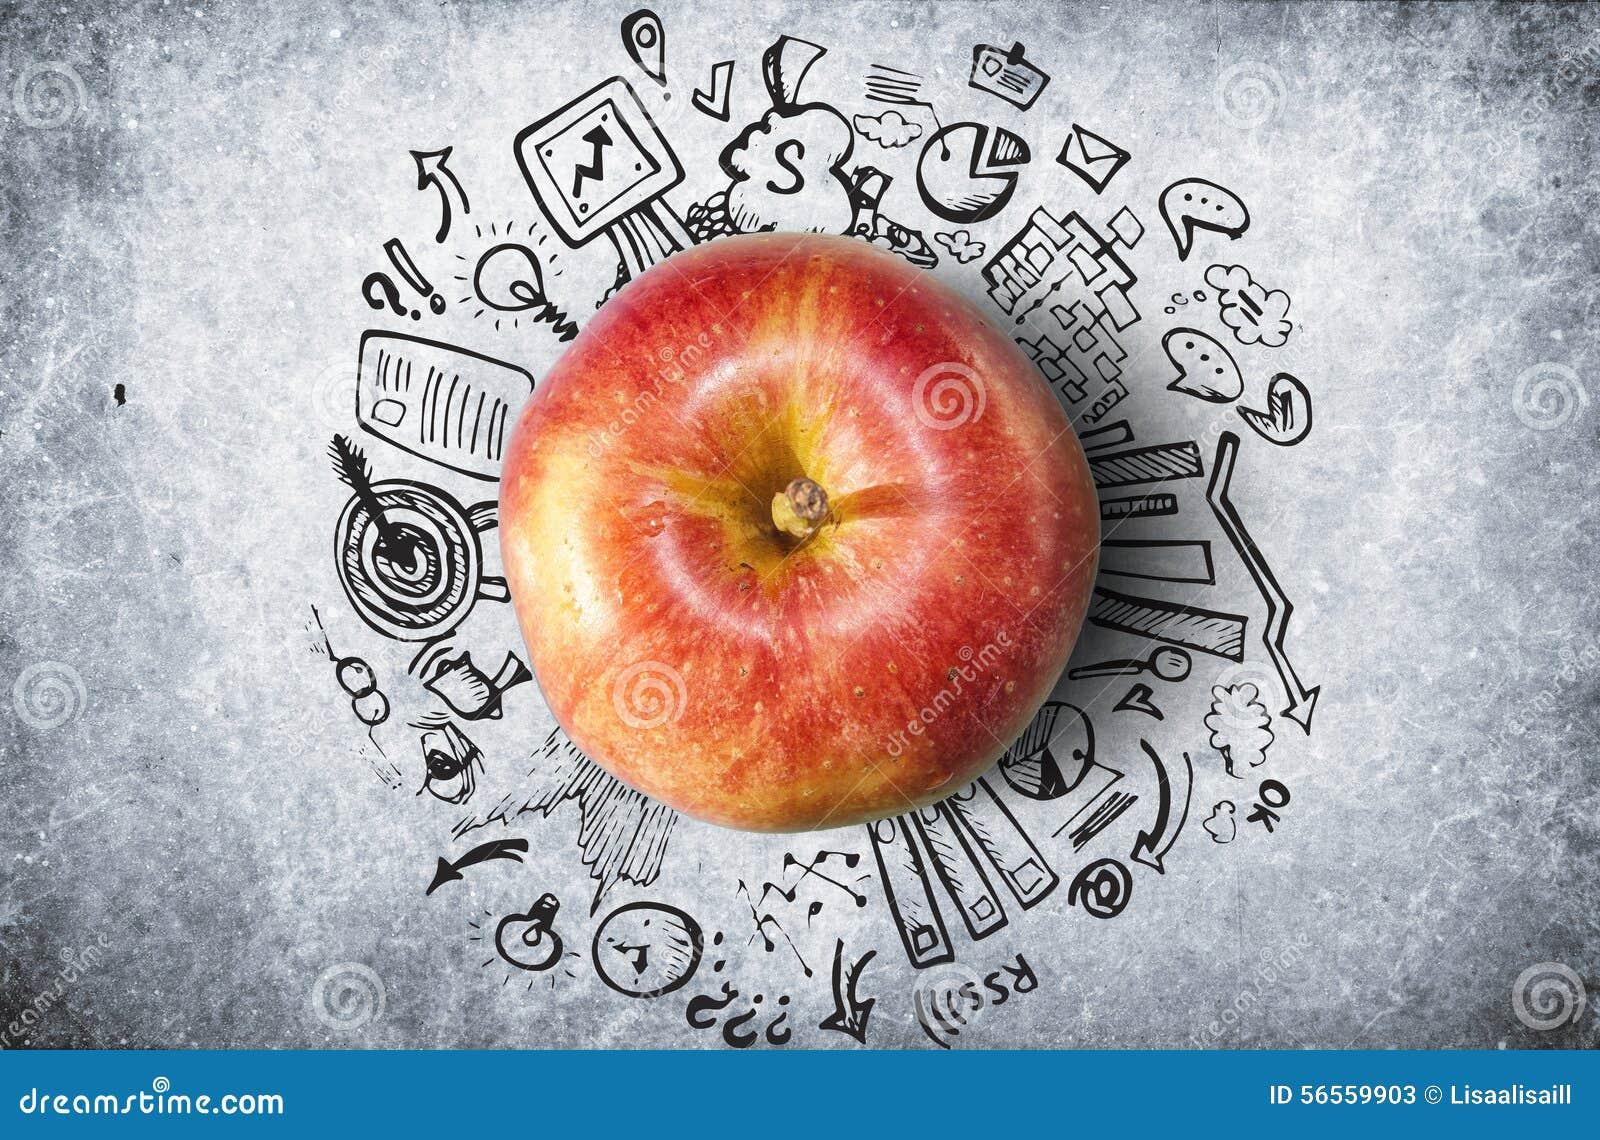 Download Έννοια με το μήλο και την επιχείρηση Doodles Απεικόνιση αποθεμάτων - εικονογραφία από δημιουργήστε, ανασκόπησης: 56559903